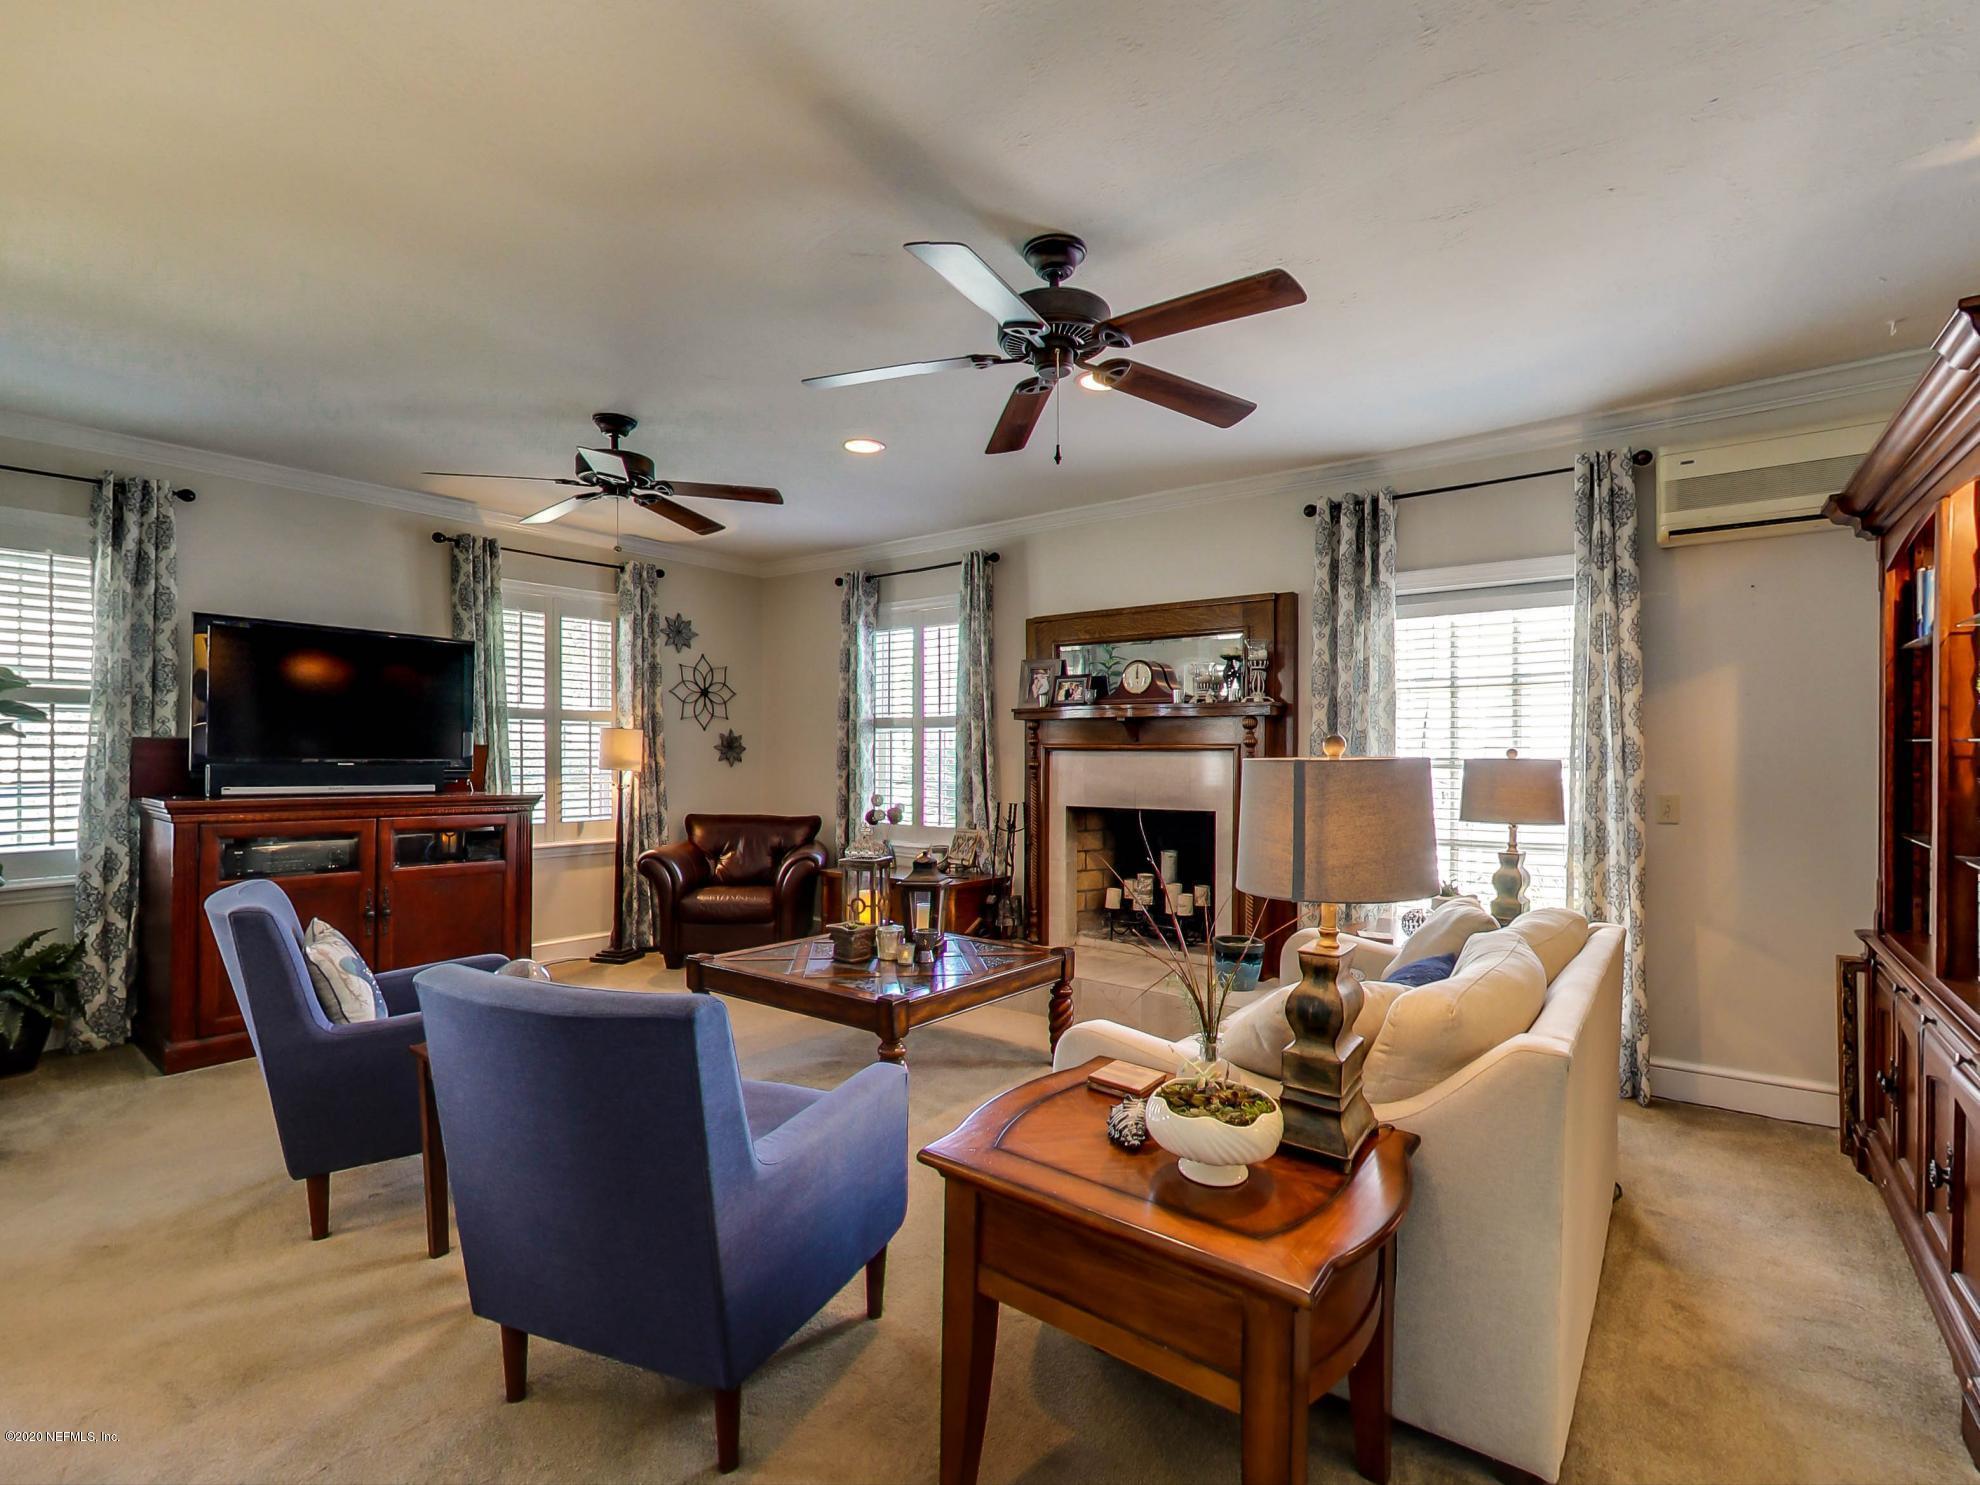 102 7TH, FERNANDINA BEACH, FLORIDA 32034, 10 Bedrooms Bedrooms, ,10 BathroomsBathrooms,Residential,For sale,7TH,1052551